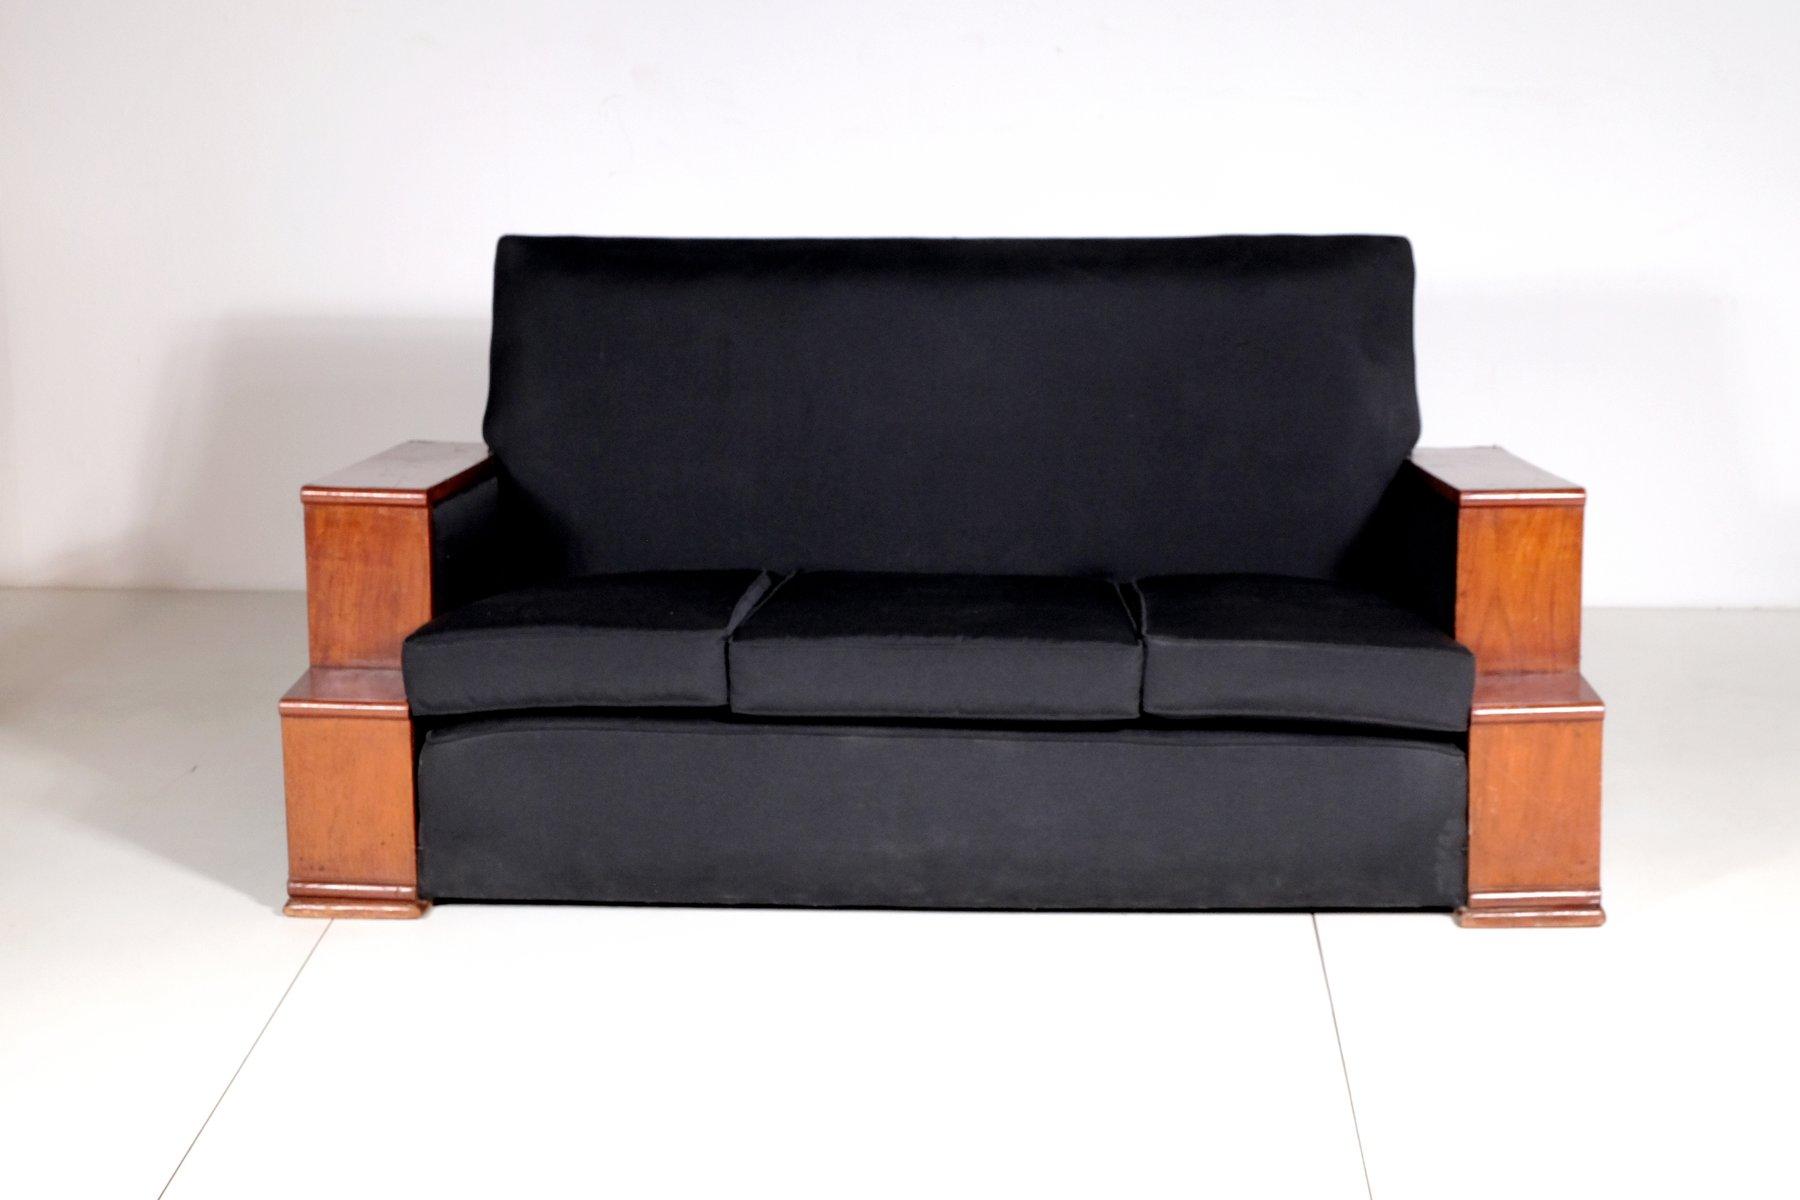 vintage art deco furniture. Vintage Art Deco Rosewood And Black Cotton Sofa, 1930s Furniture E